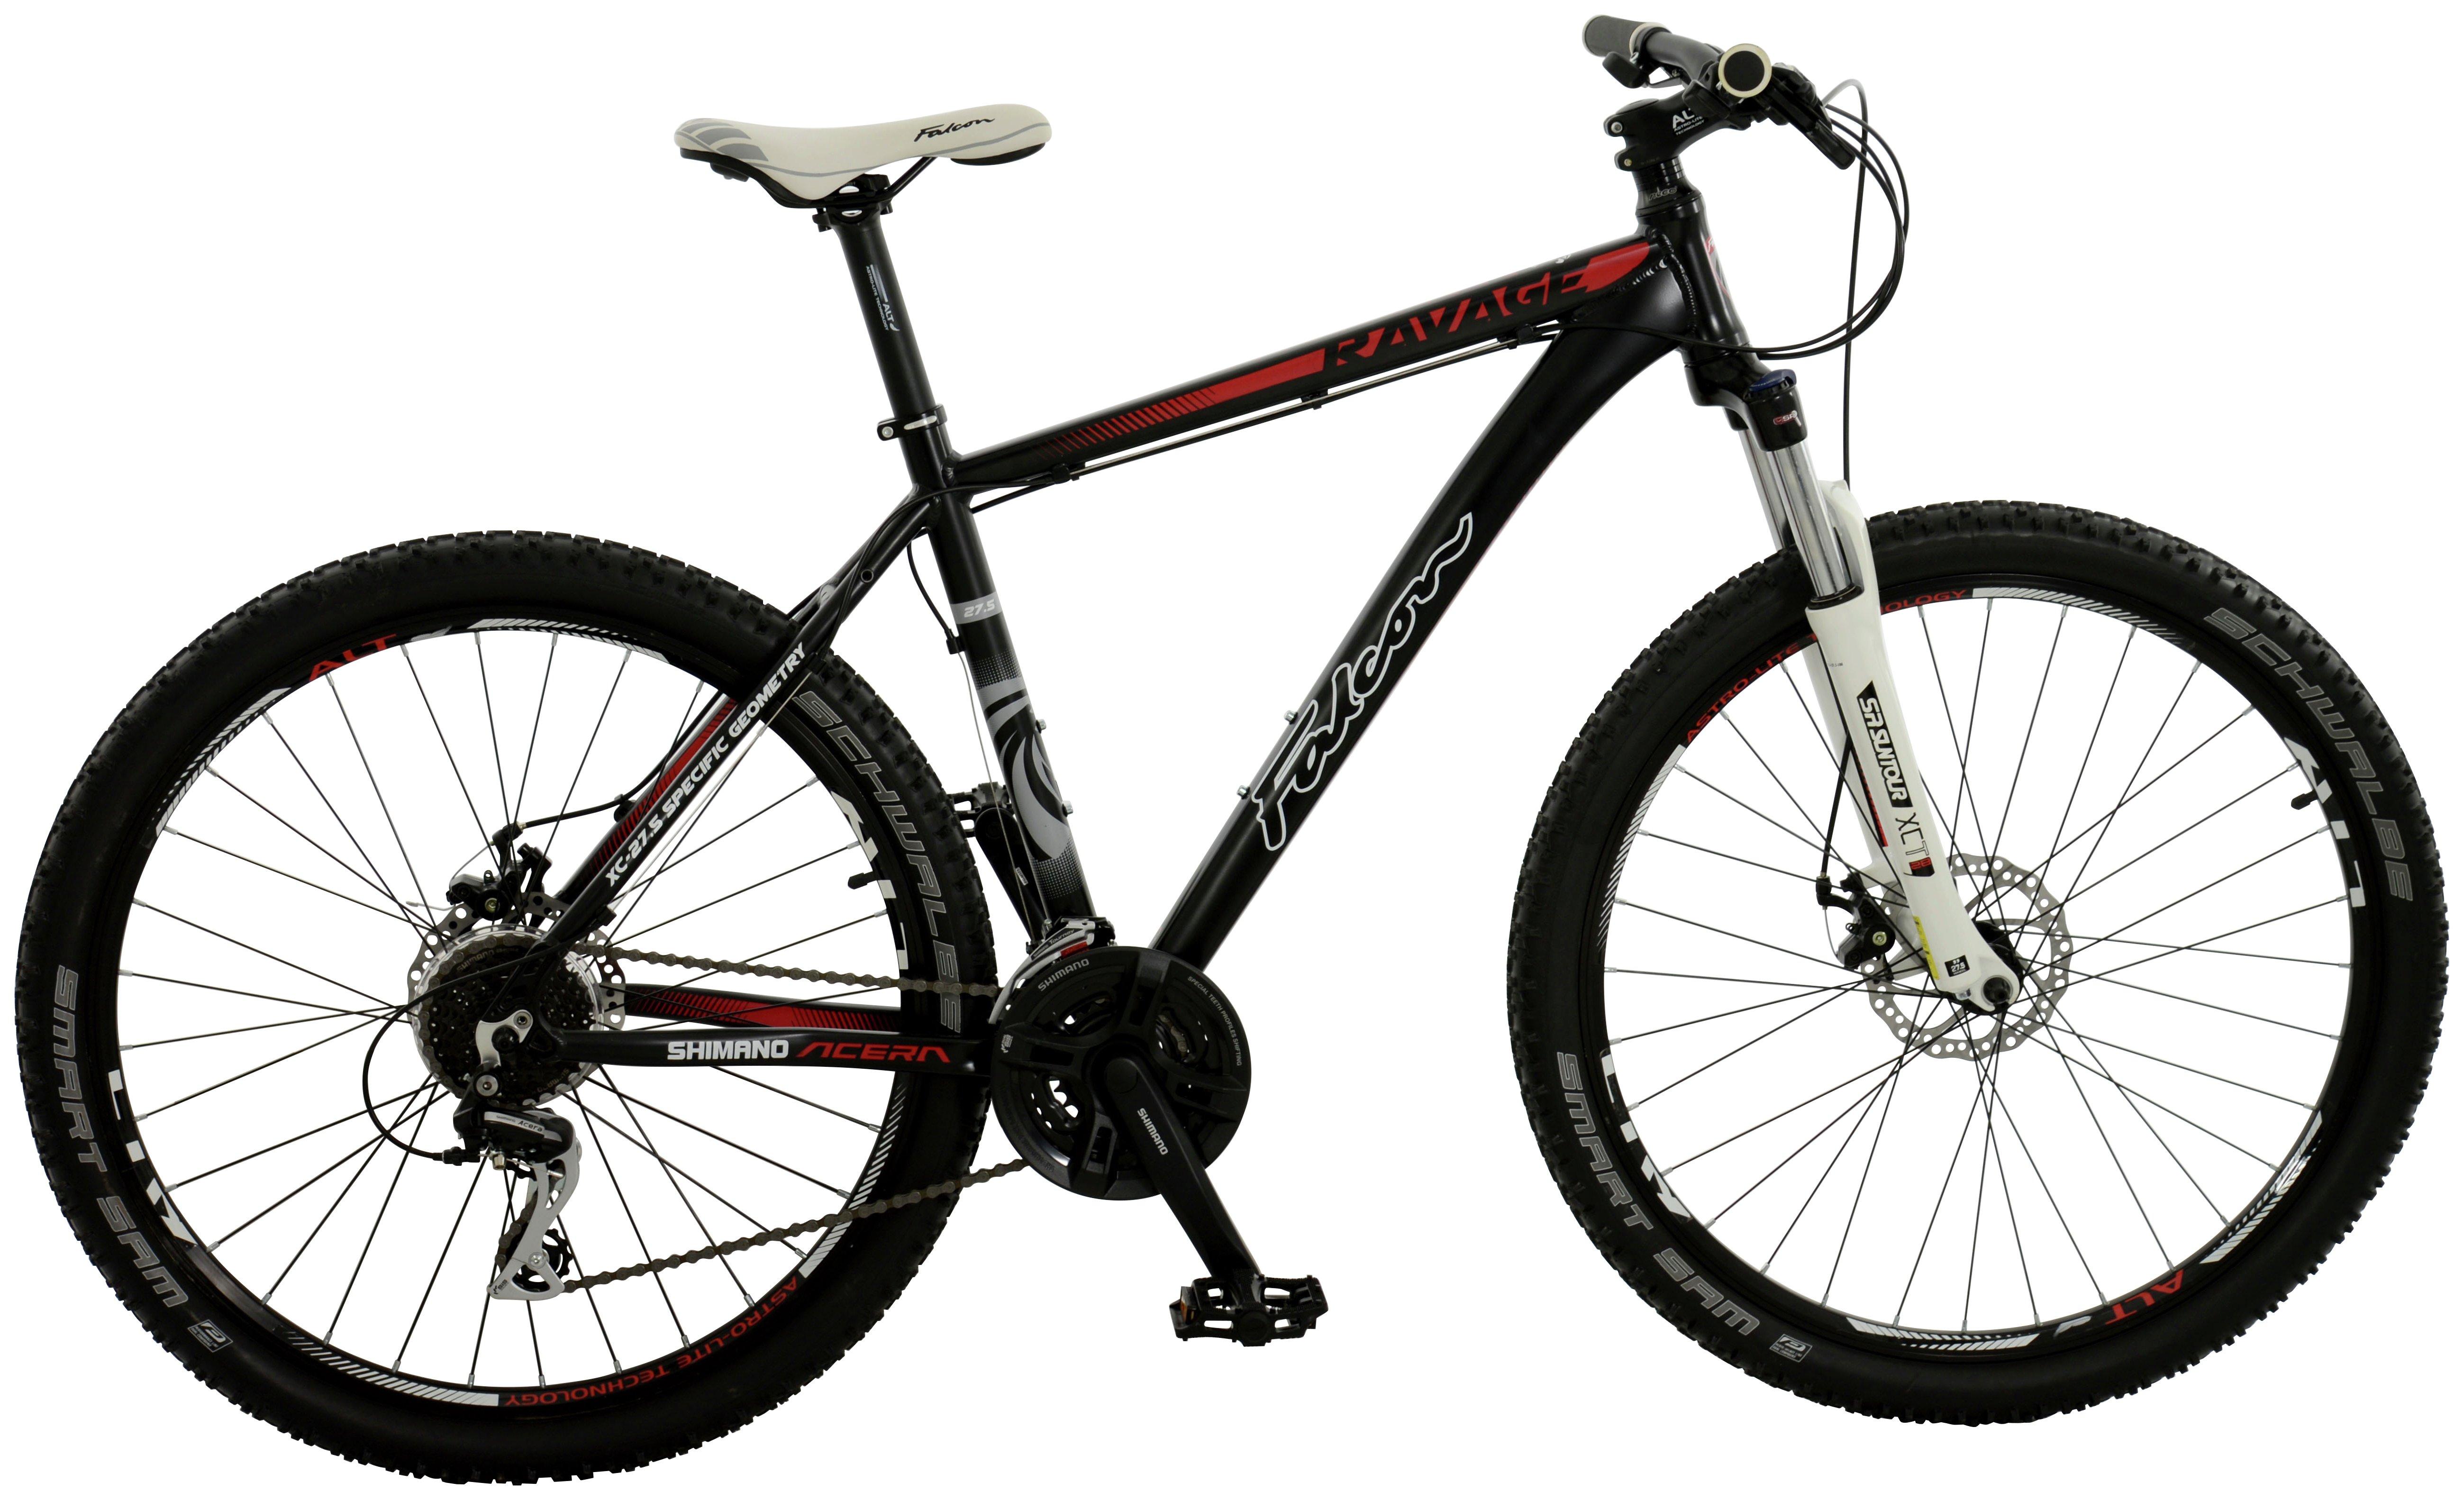 Image of Falcon Ravage Front Suspension Mountain Bike